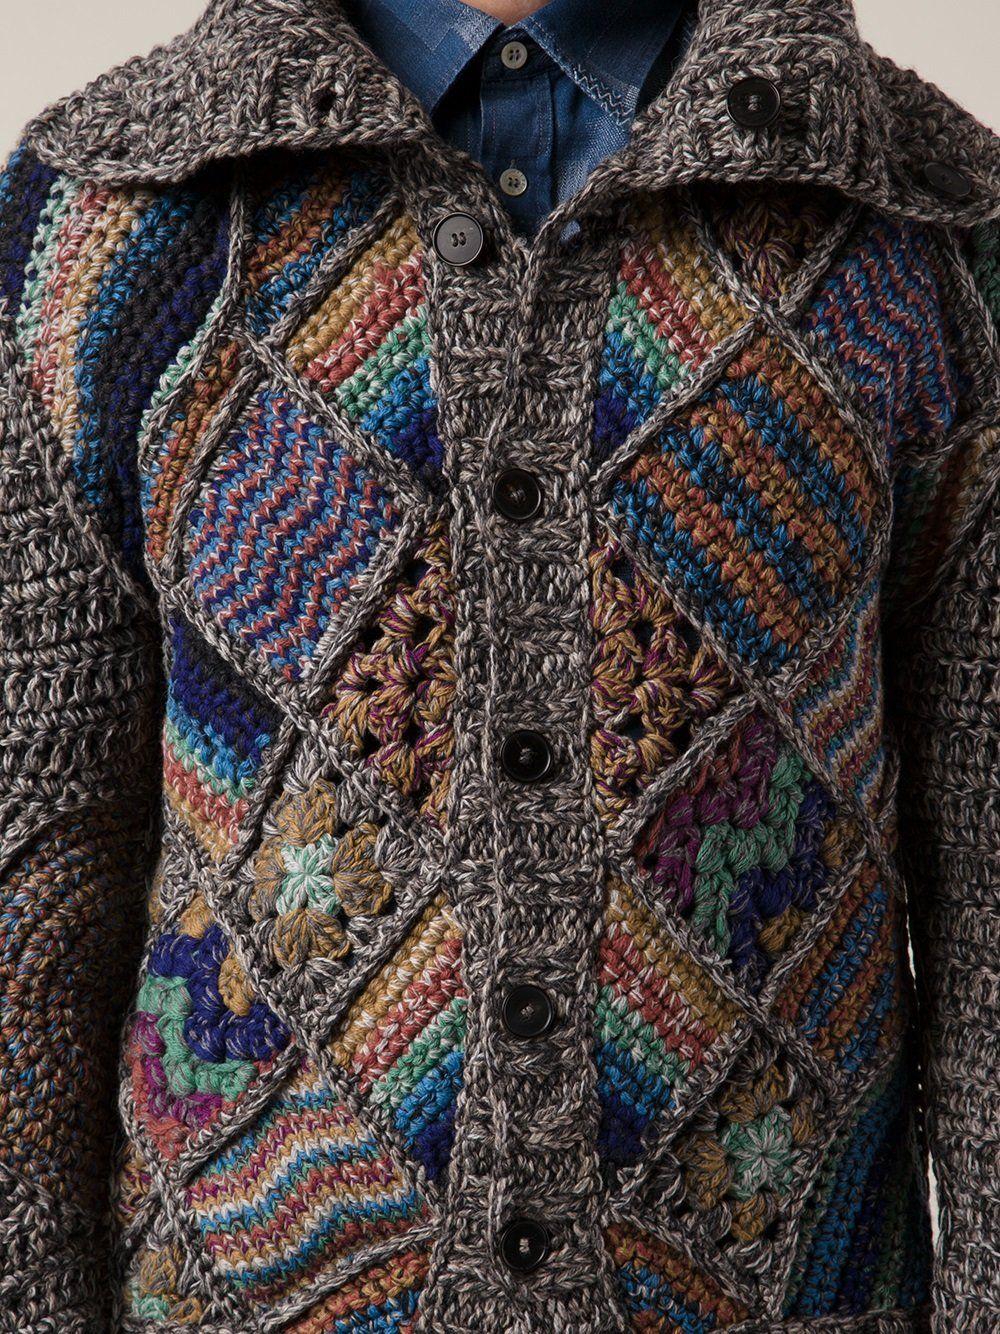 Handmade Patchwork Cardigan